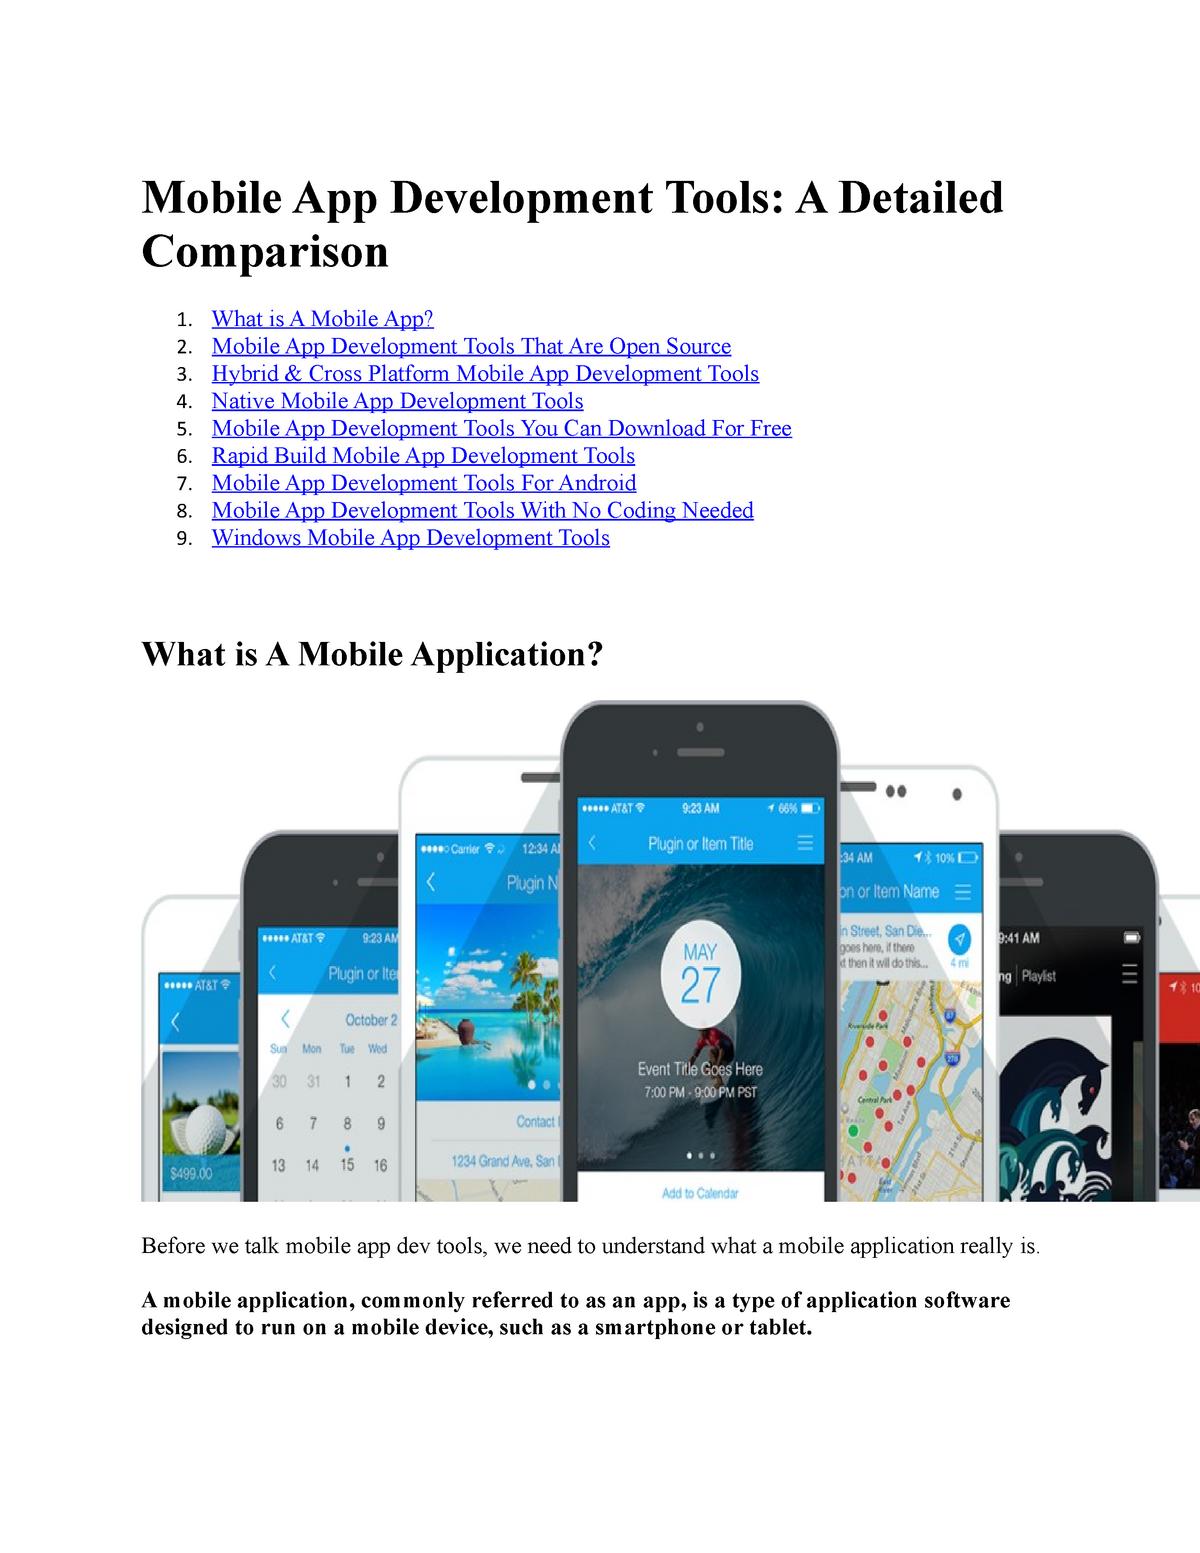 Mobile App Development Tools - FIT1046: Bachelor of Information